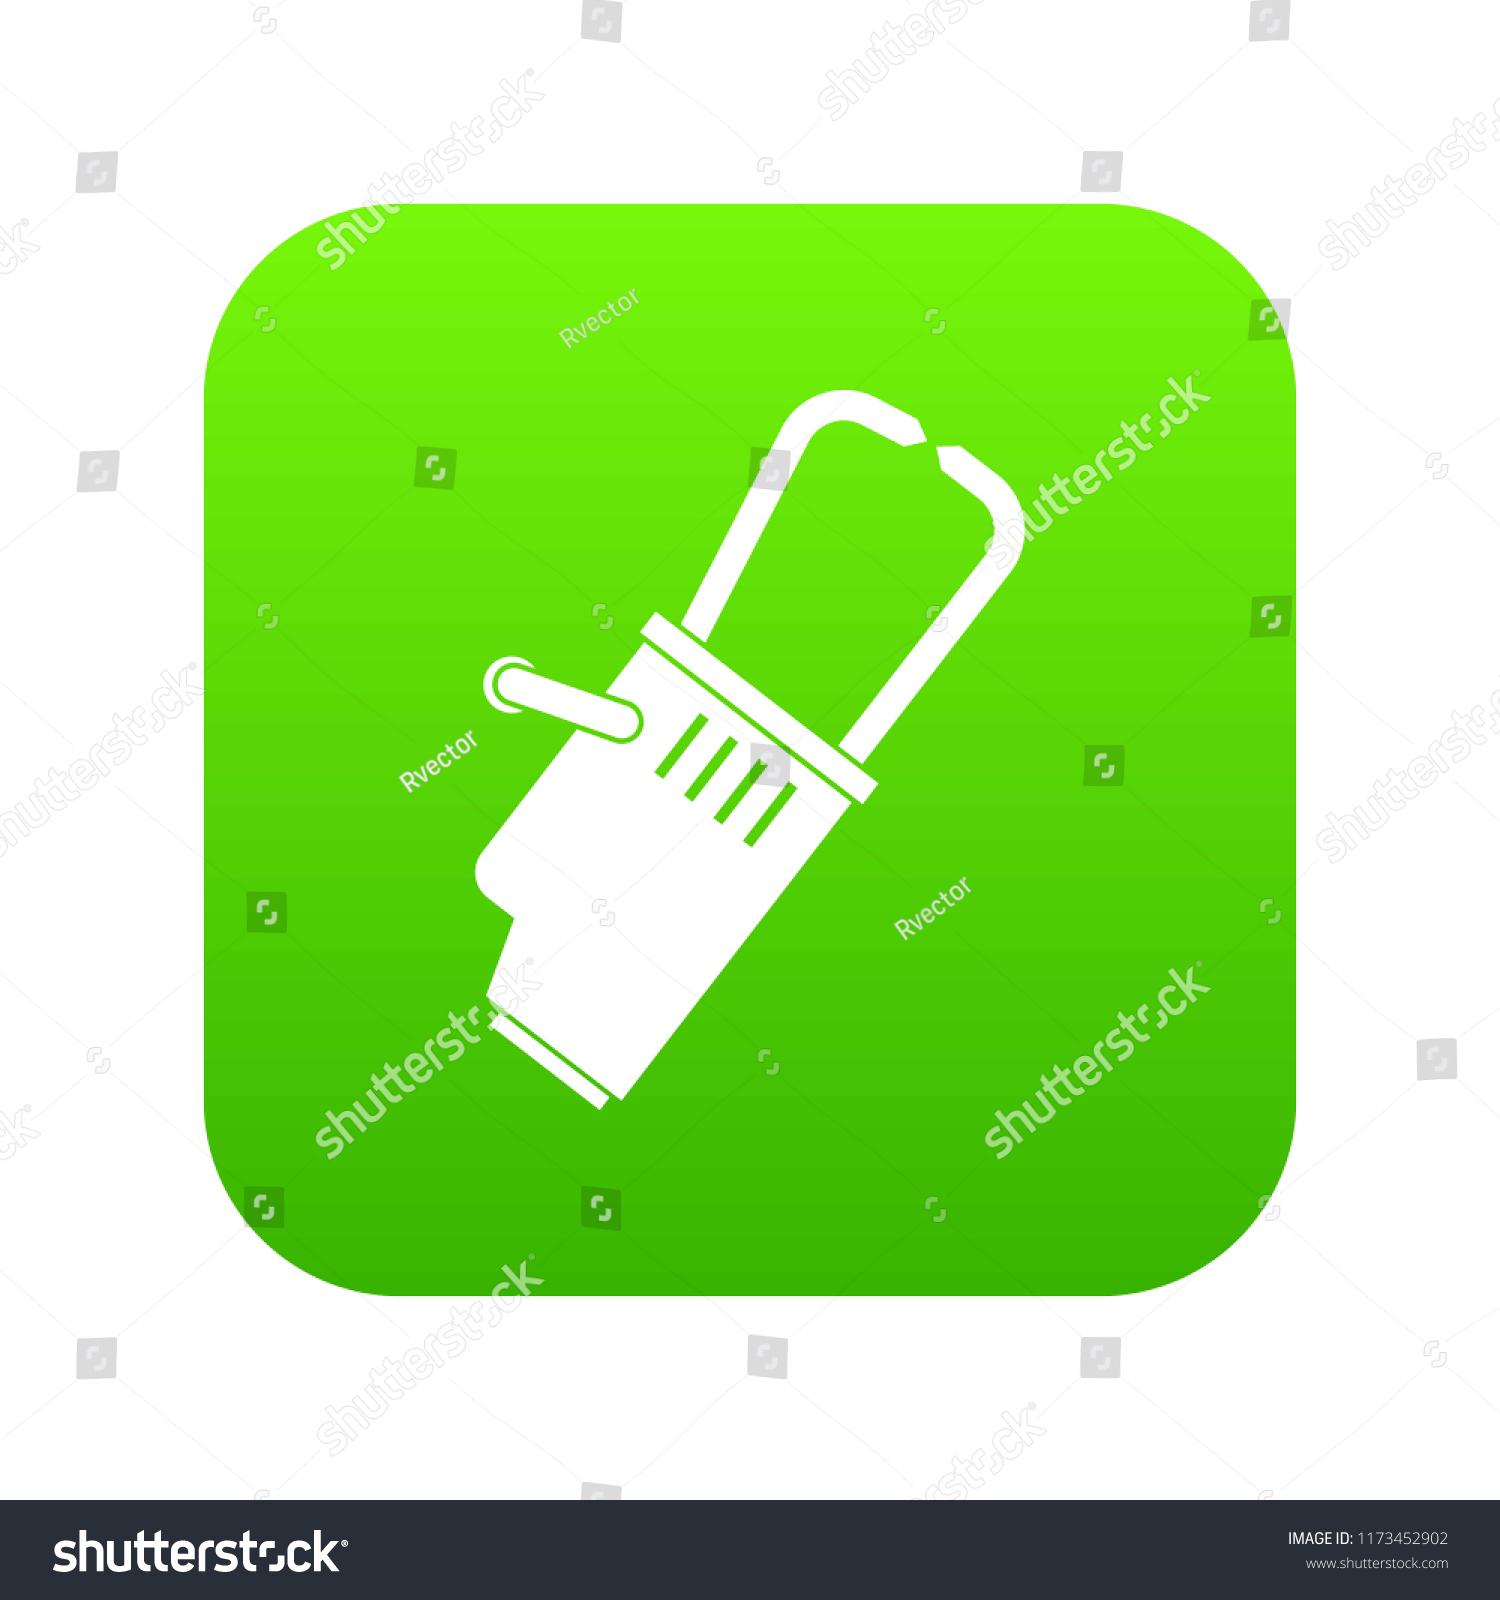 Welding Equipment Icon Digital Green Any Stock Illustration Diagram For Design Isolated On White